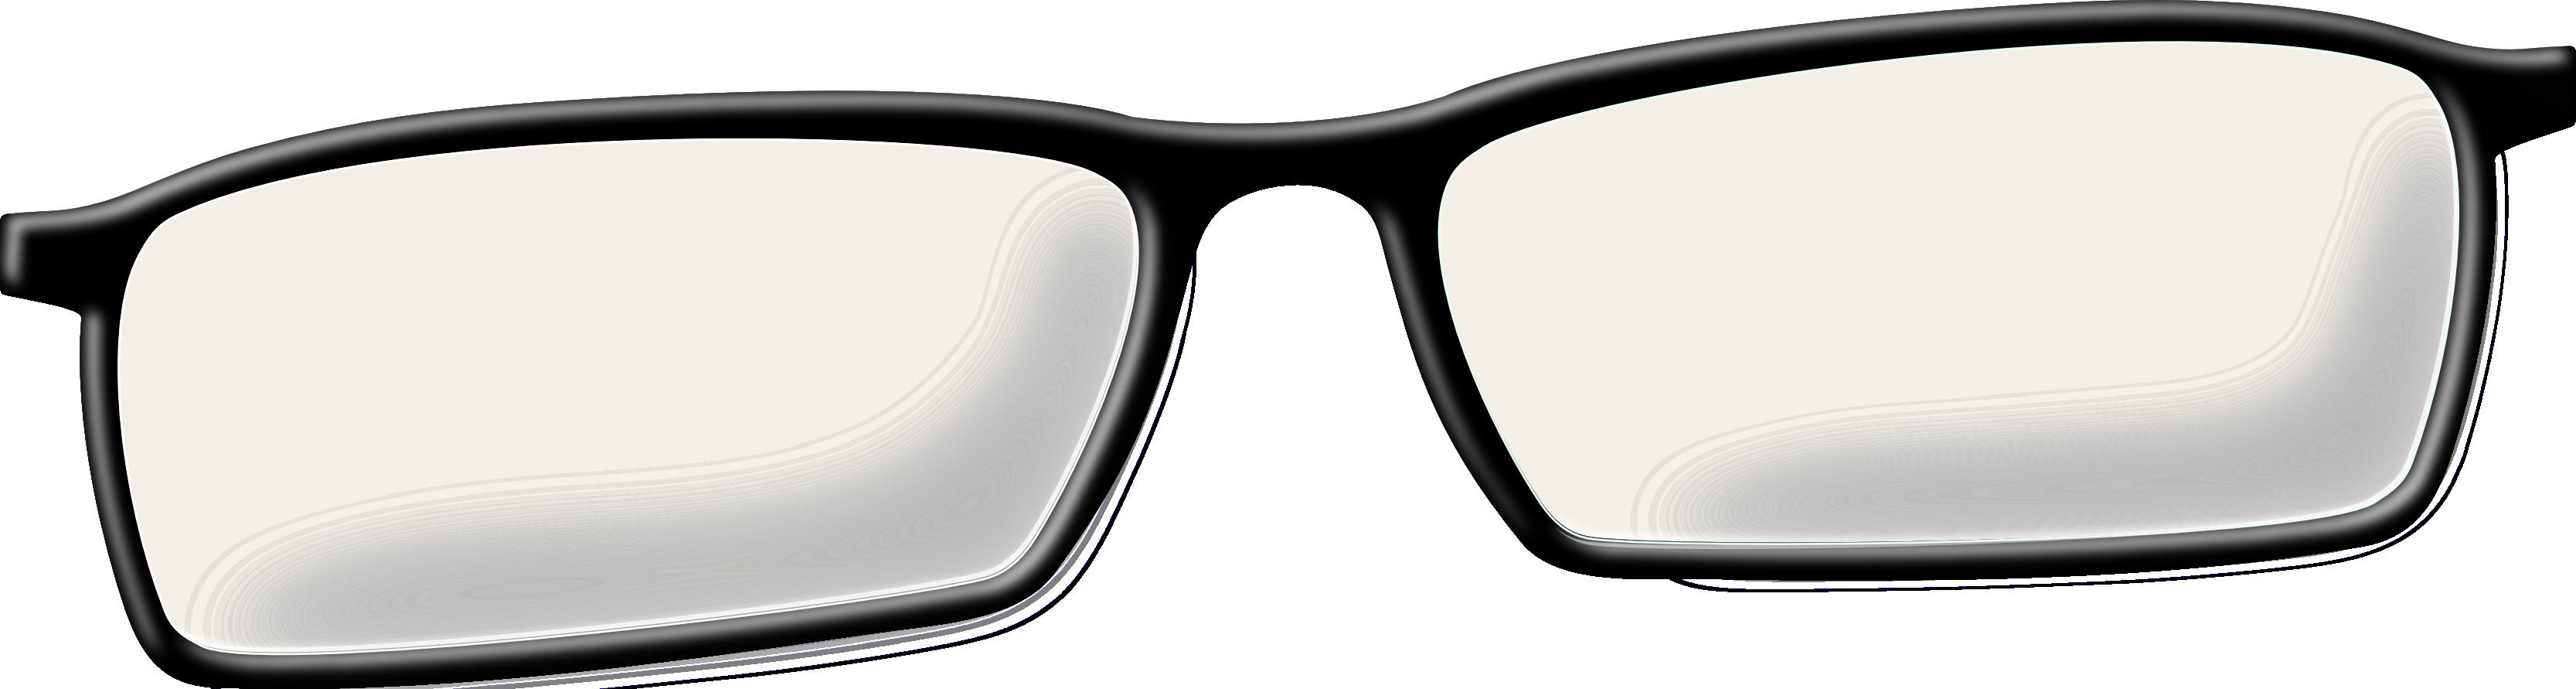 collection of glasses. Eyeglasses clipart eye doctor equipment